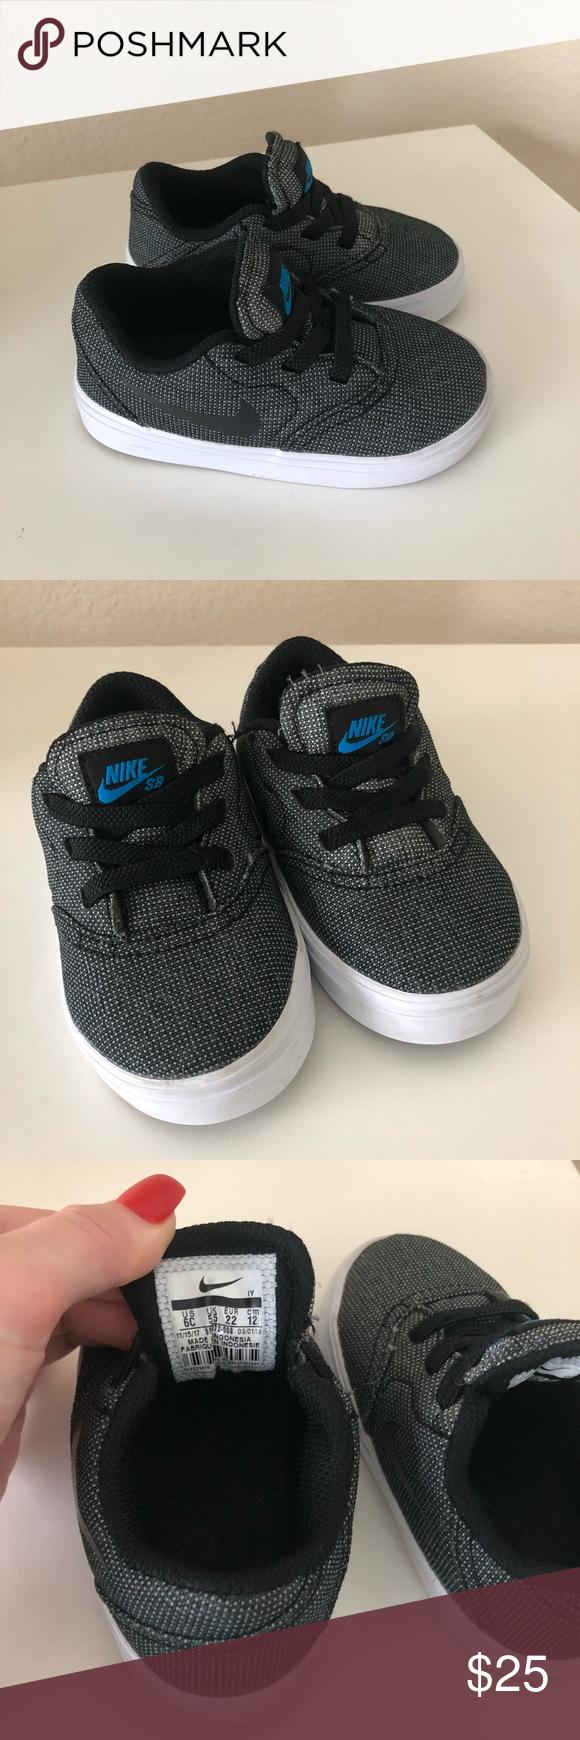 Boys Nike, Toddler Boys, Nike S